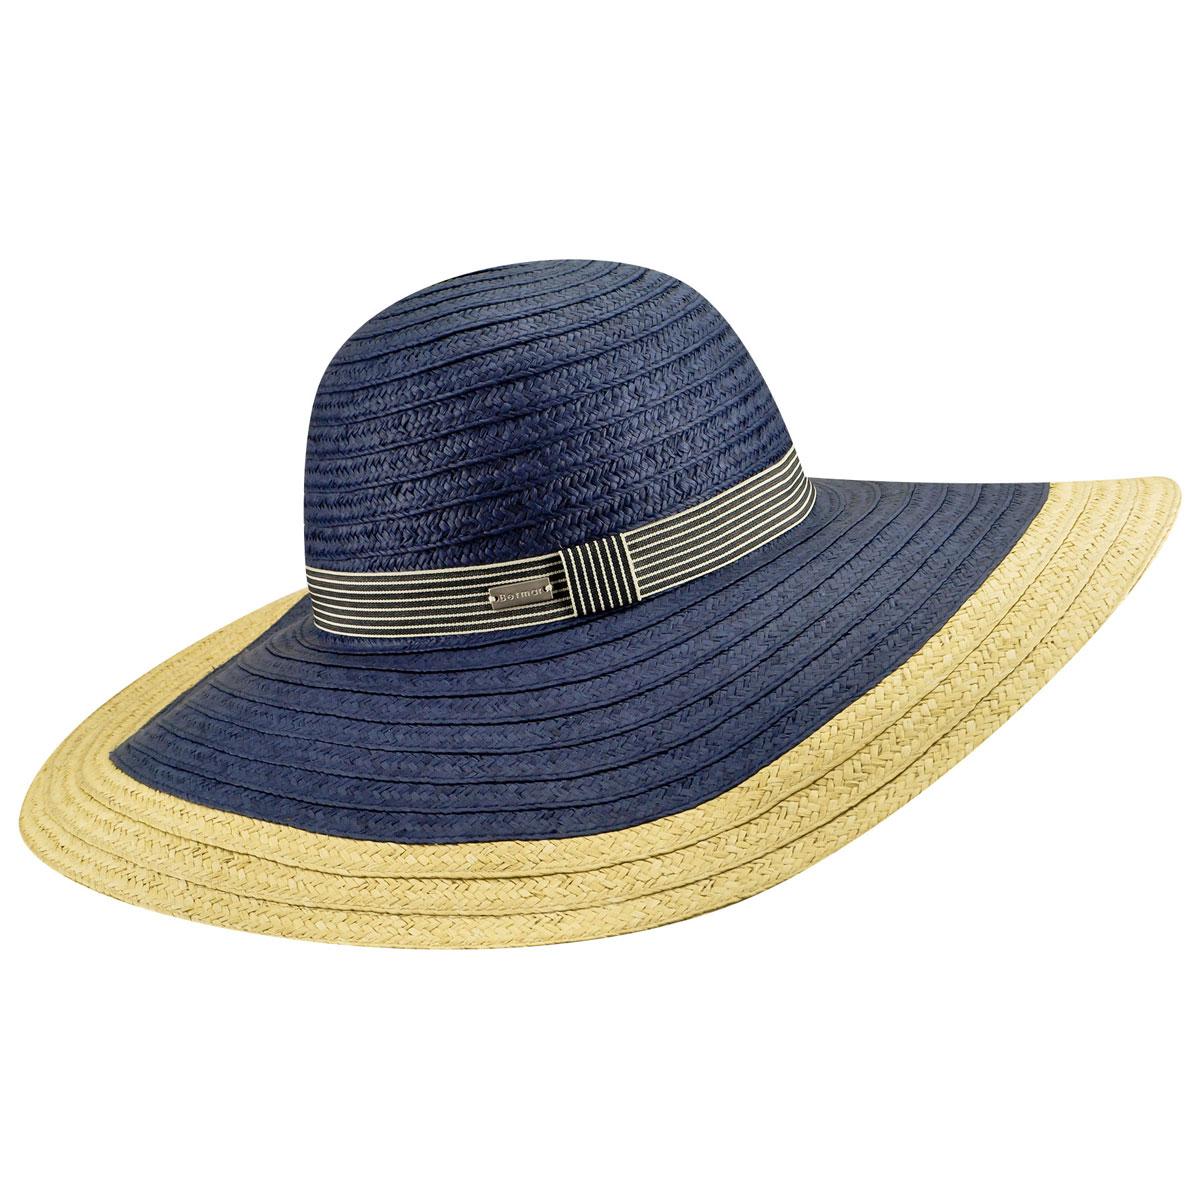 Betmar Lora Braided Floppy Wide Brim Hat in Navy,Natural